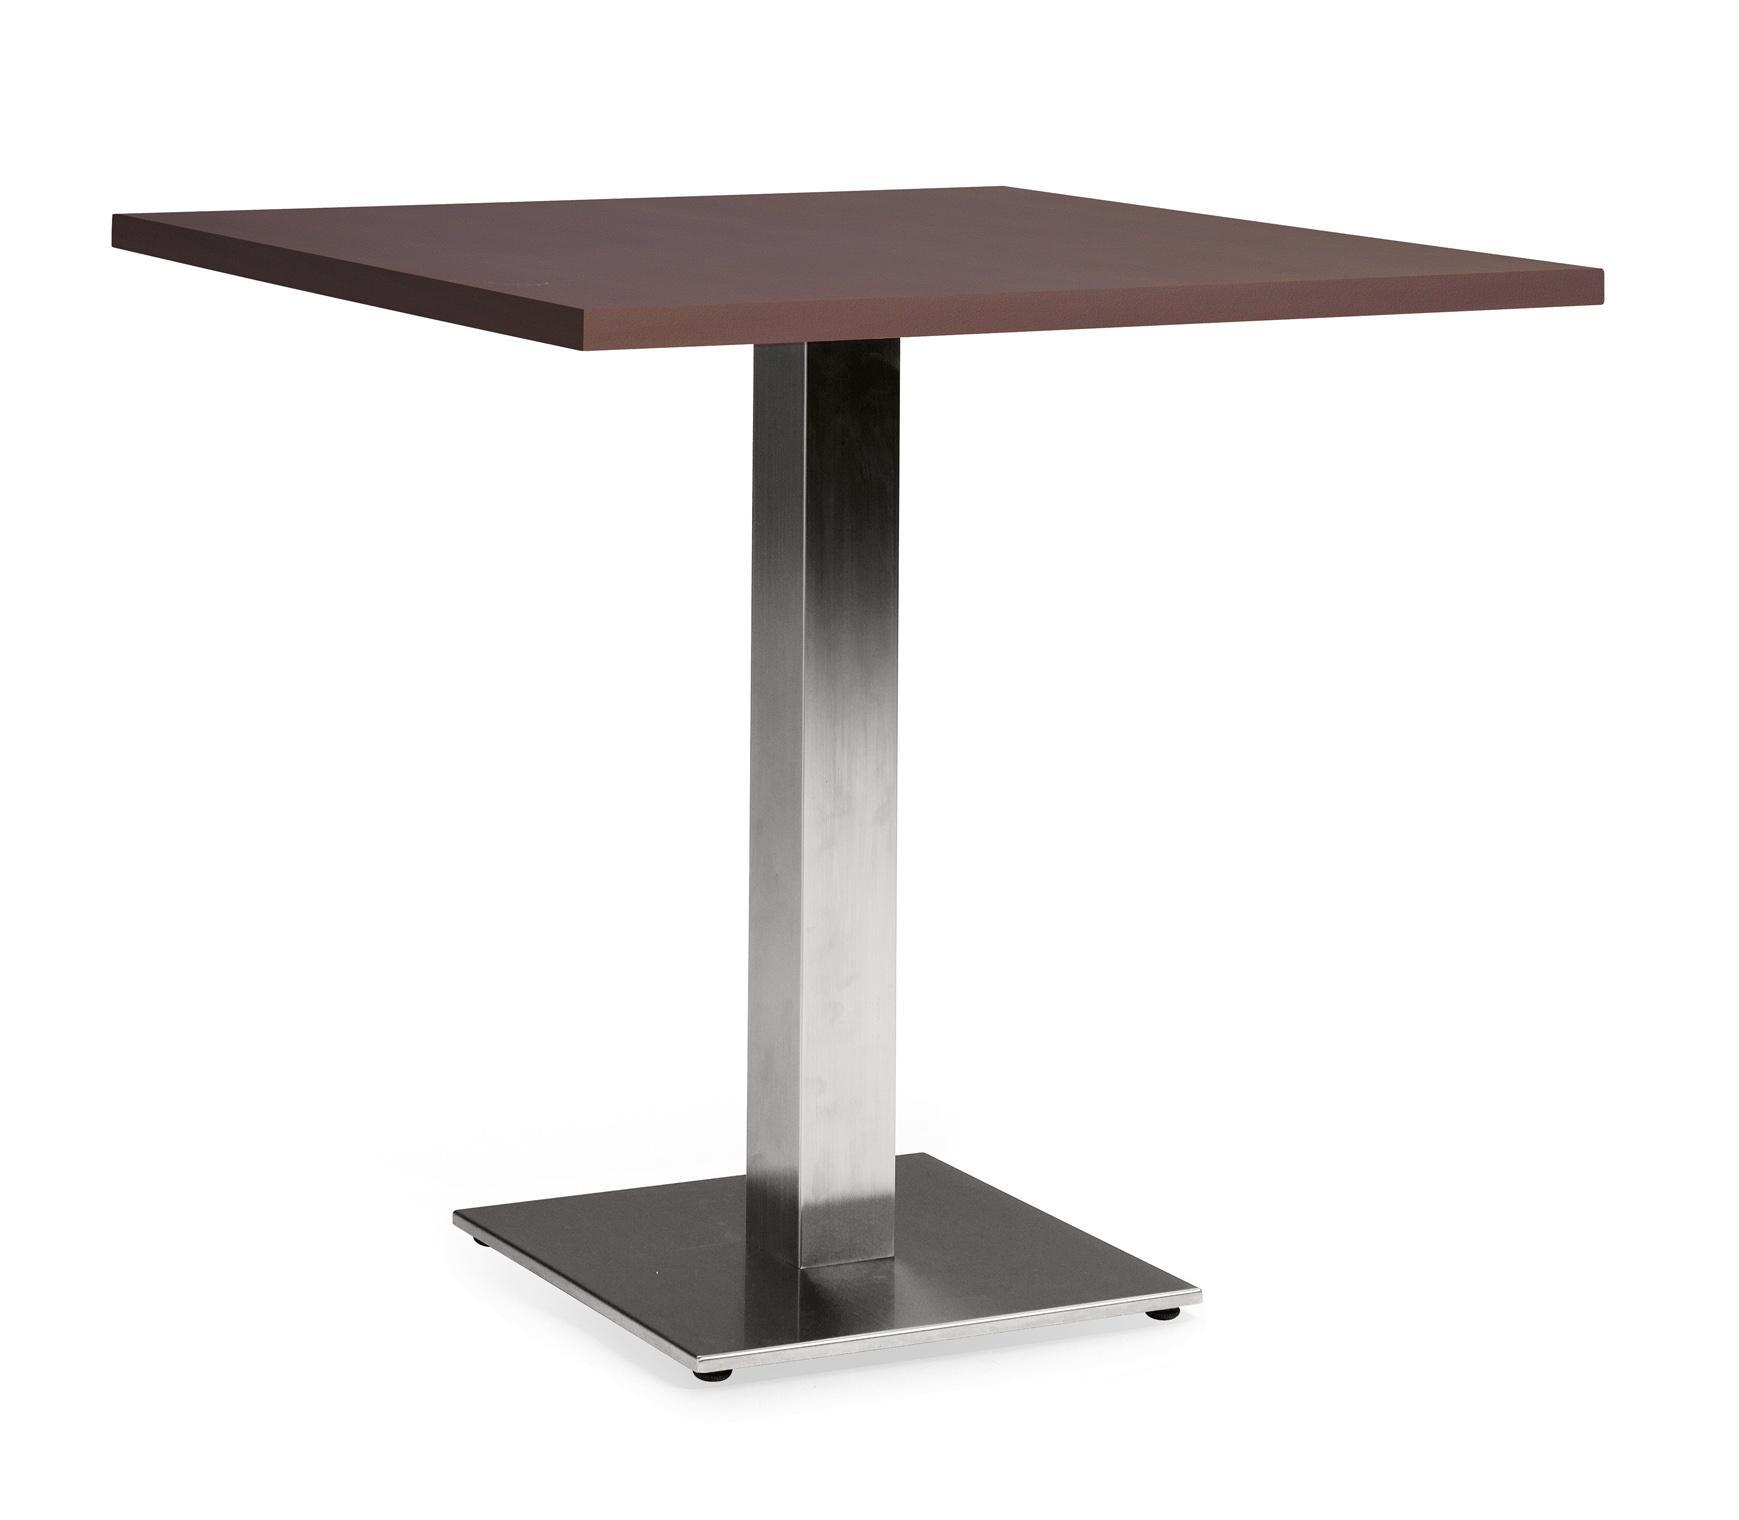 Furniture 桌子 设计 4 0 10000 0 件